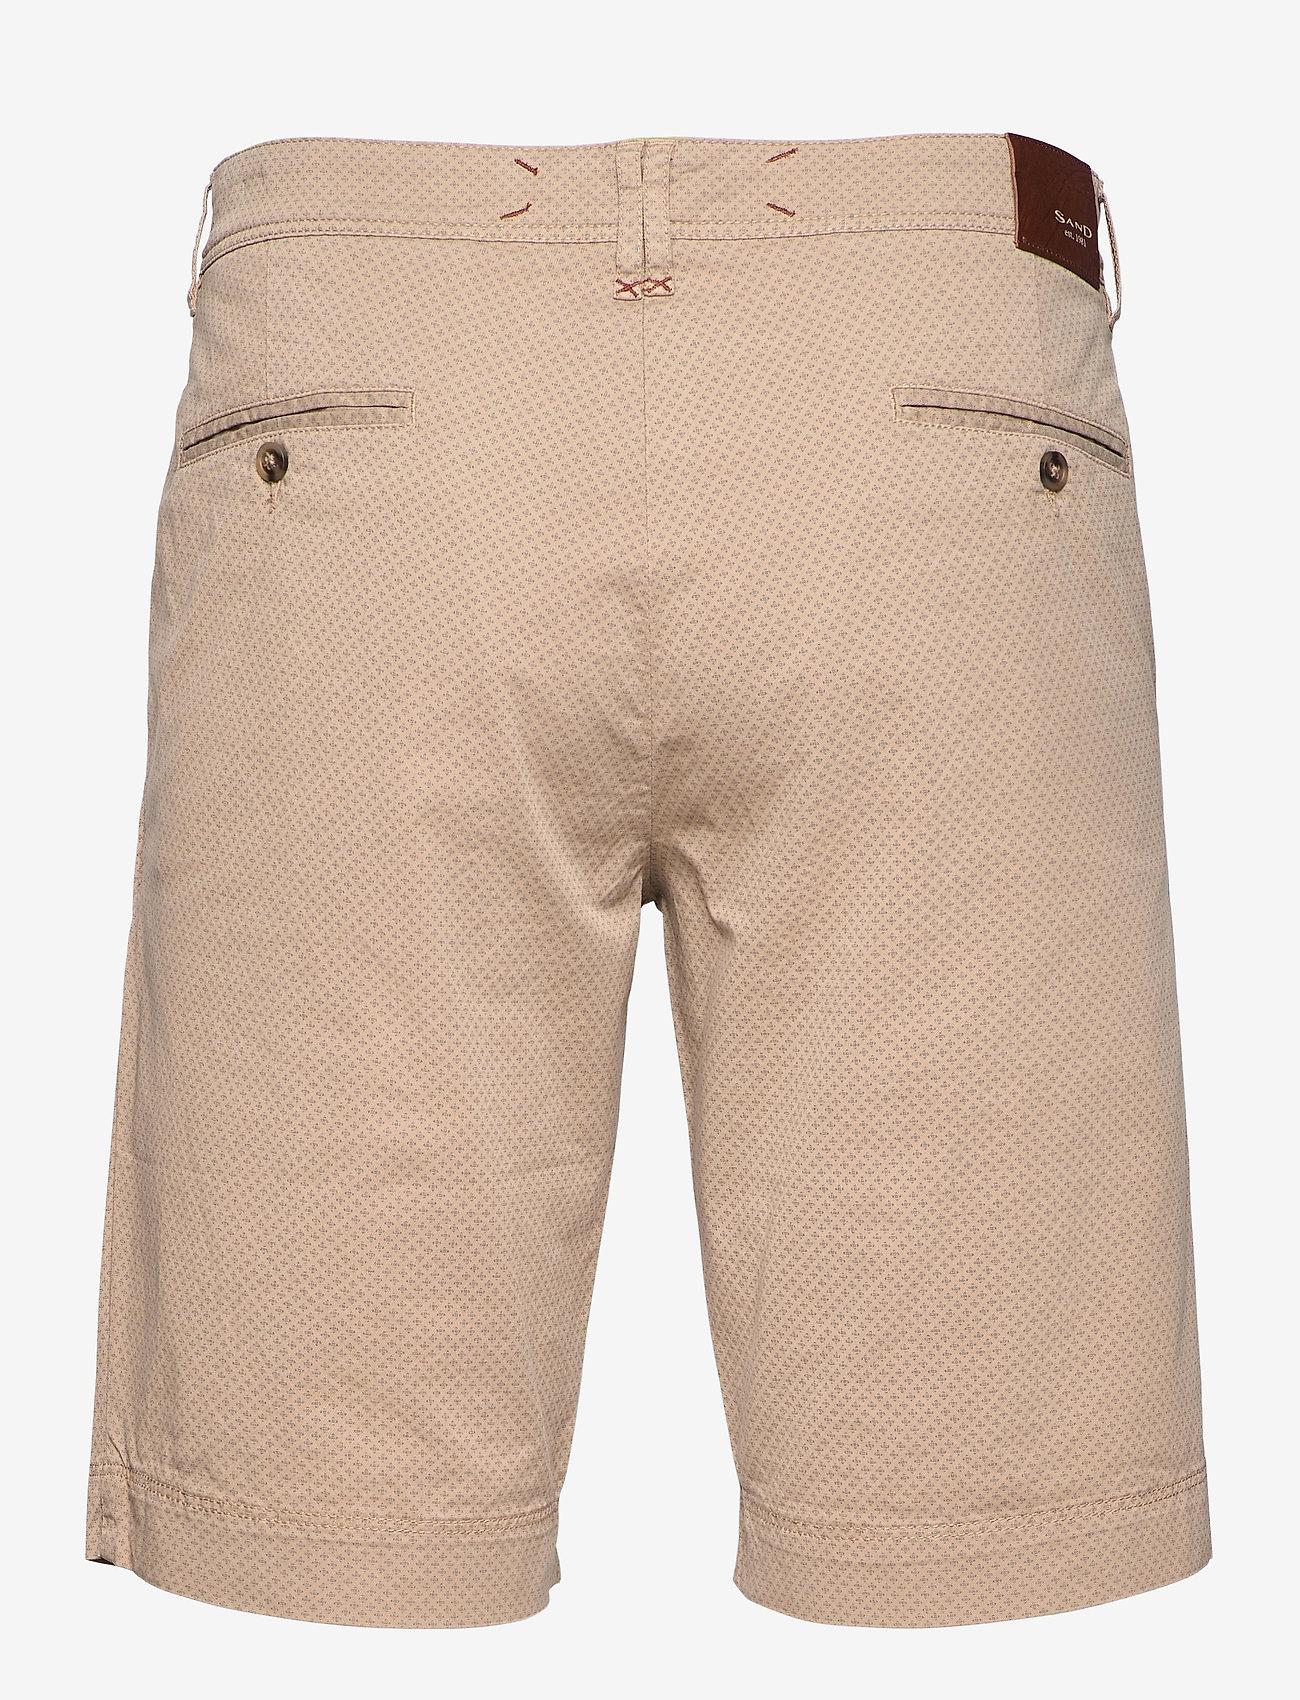 SAND - 2567 - Dolan Short - chino's shorts - light camel - 1